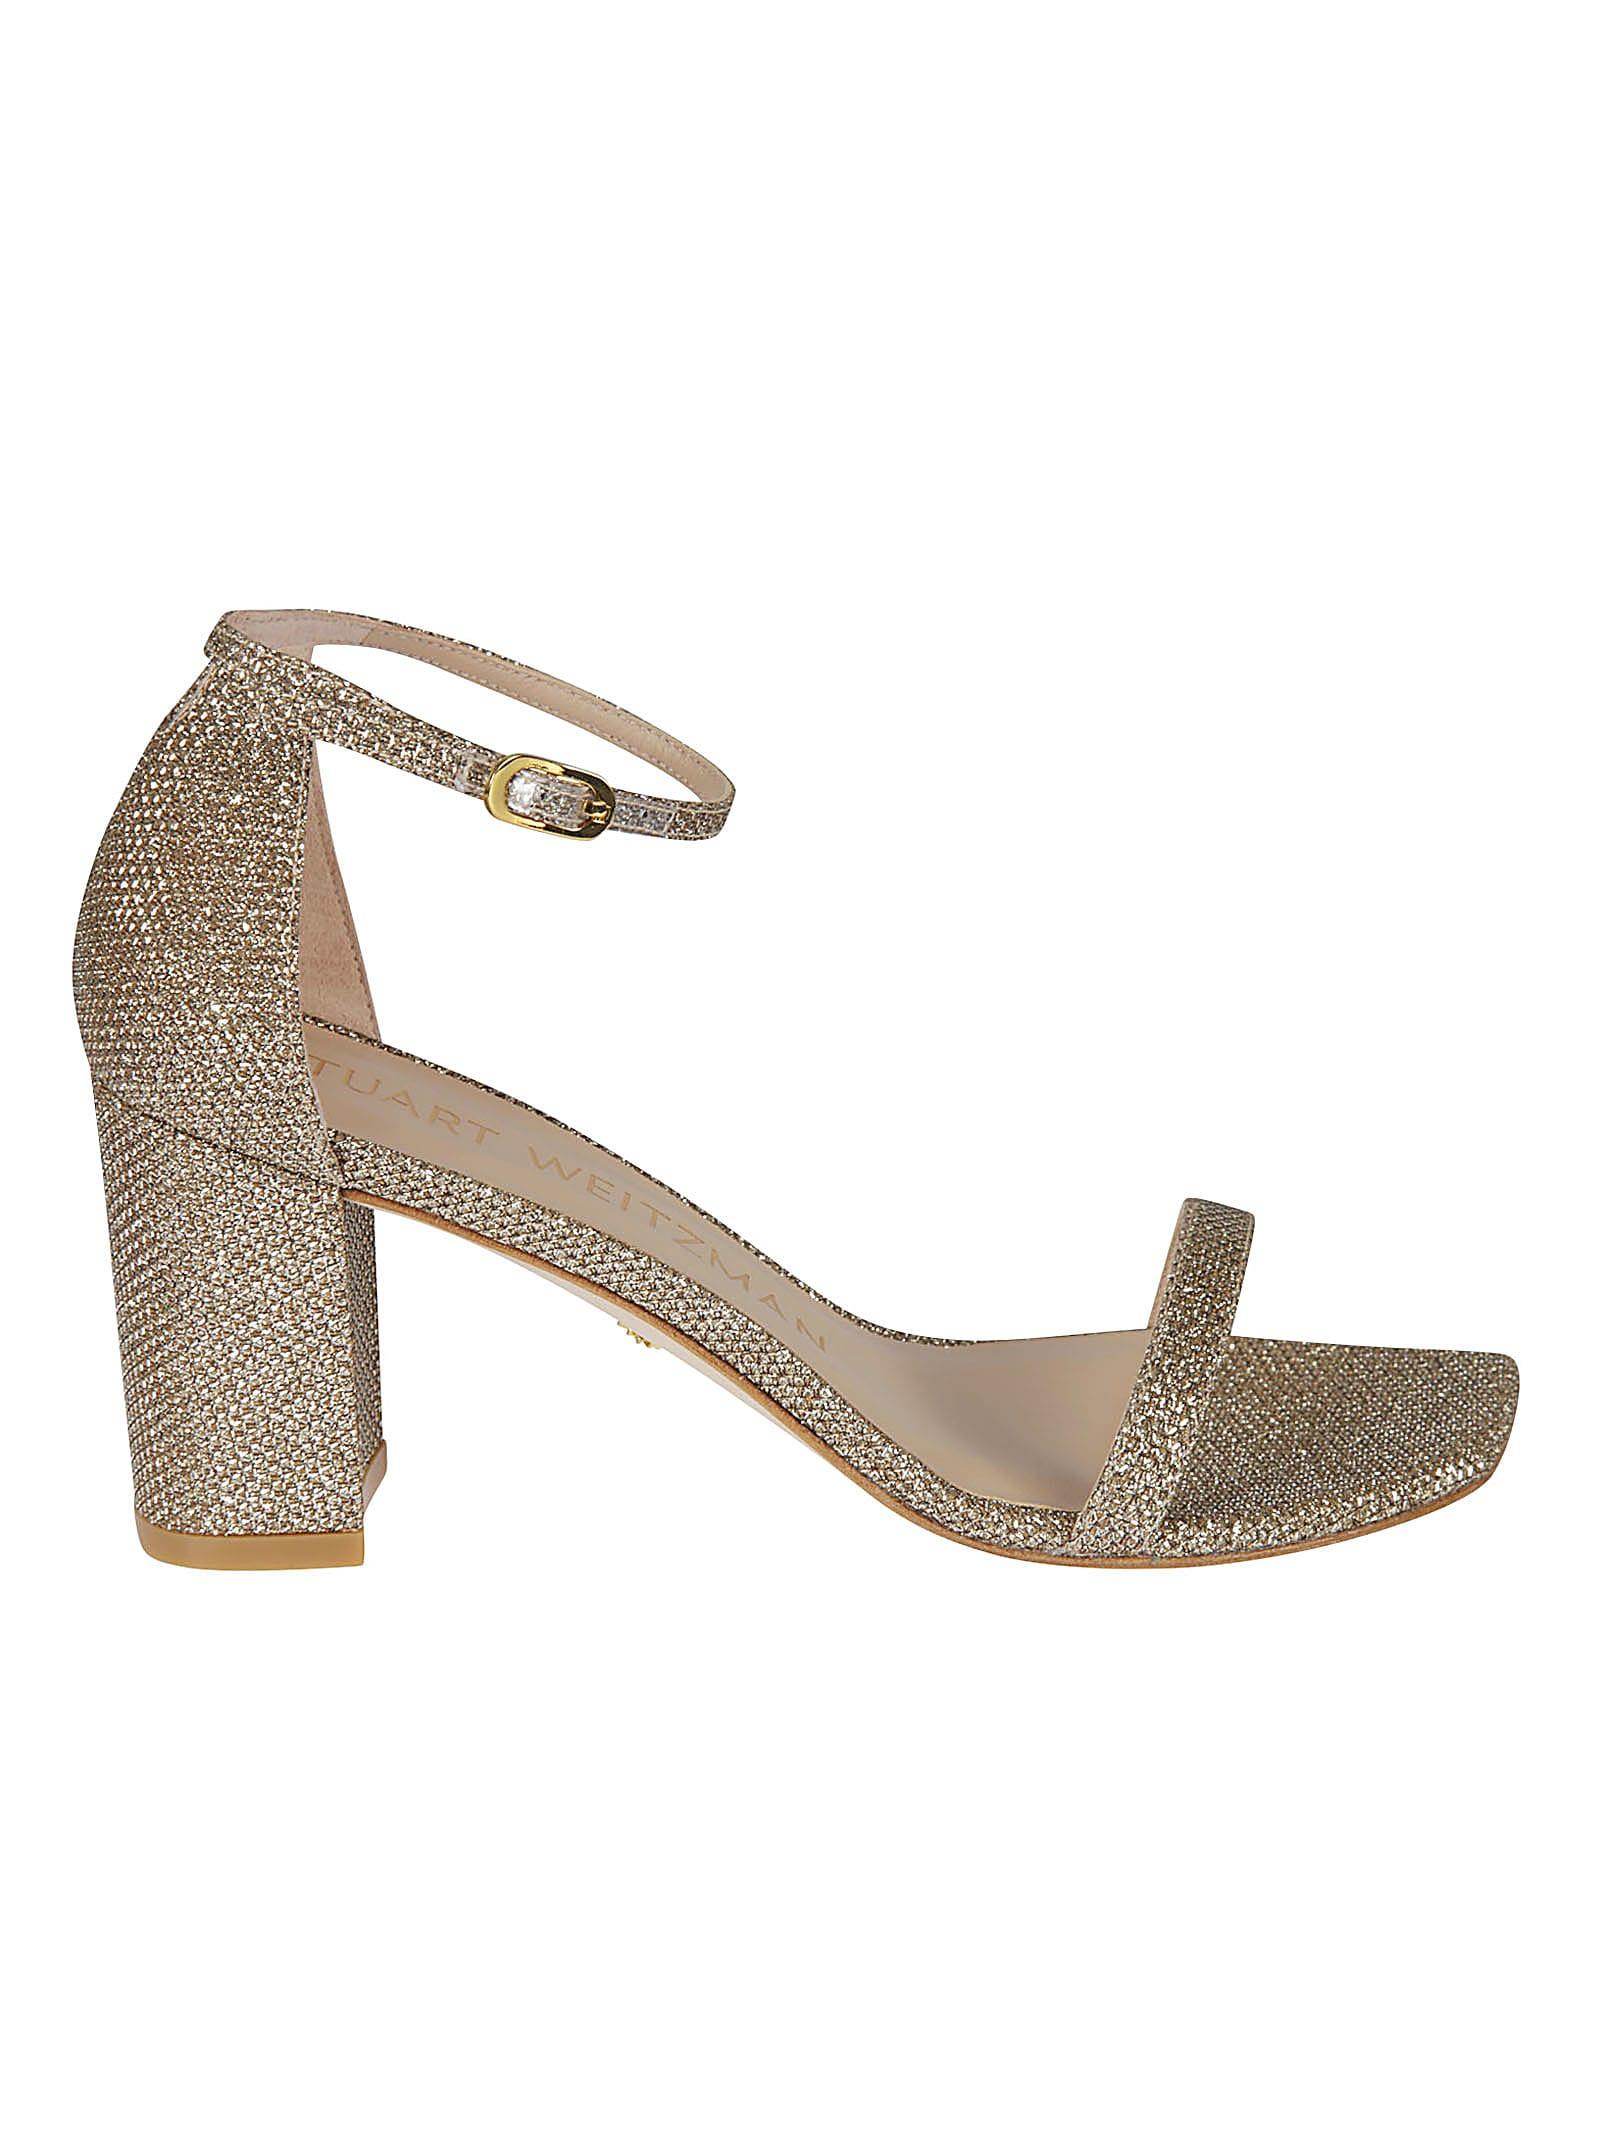 Buy Stuart Weitzman Amelina Block Sandals online, shop Stuart Weitzman shoes with free shipping